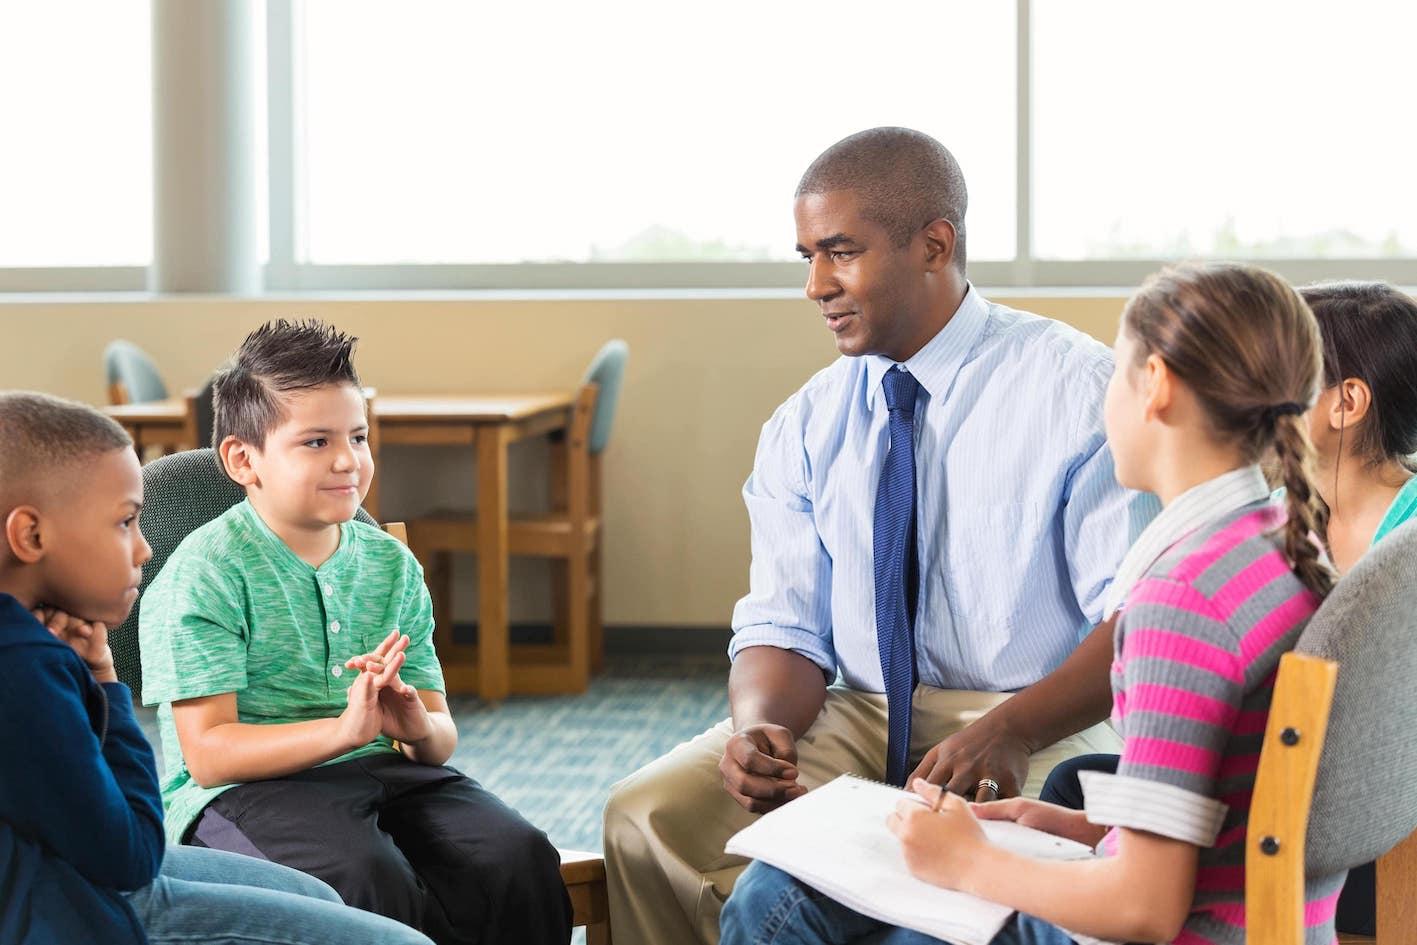 effective bullying prevention programs